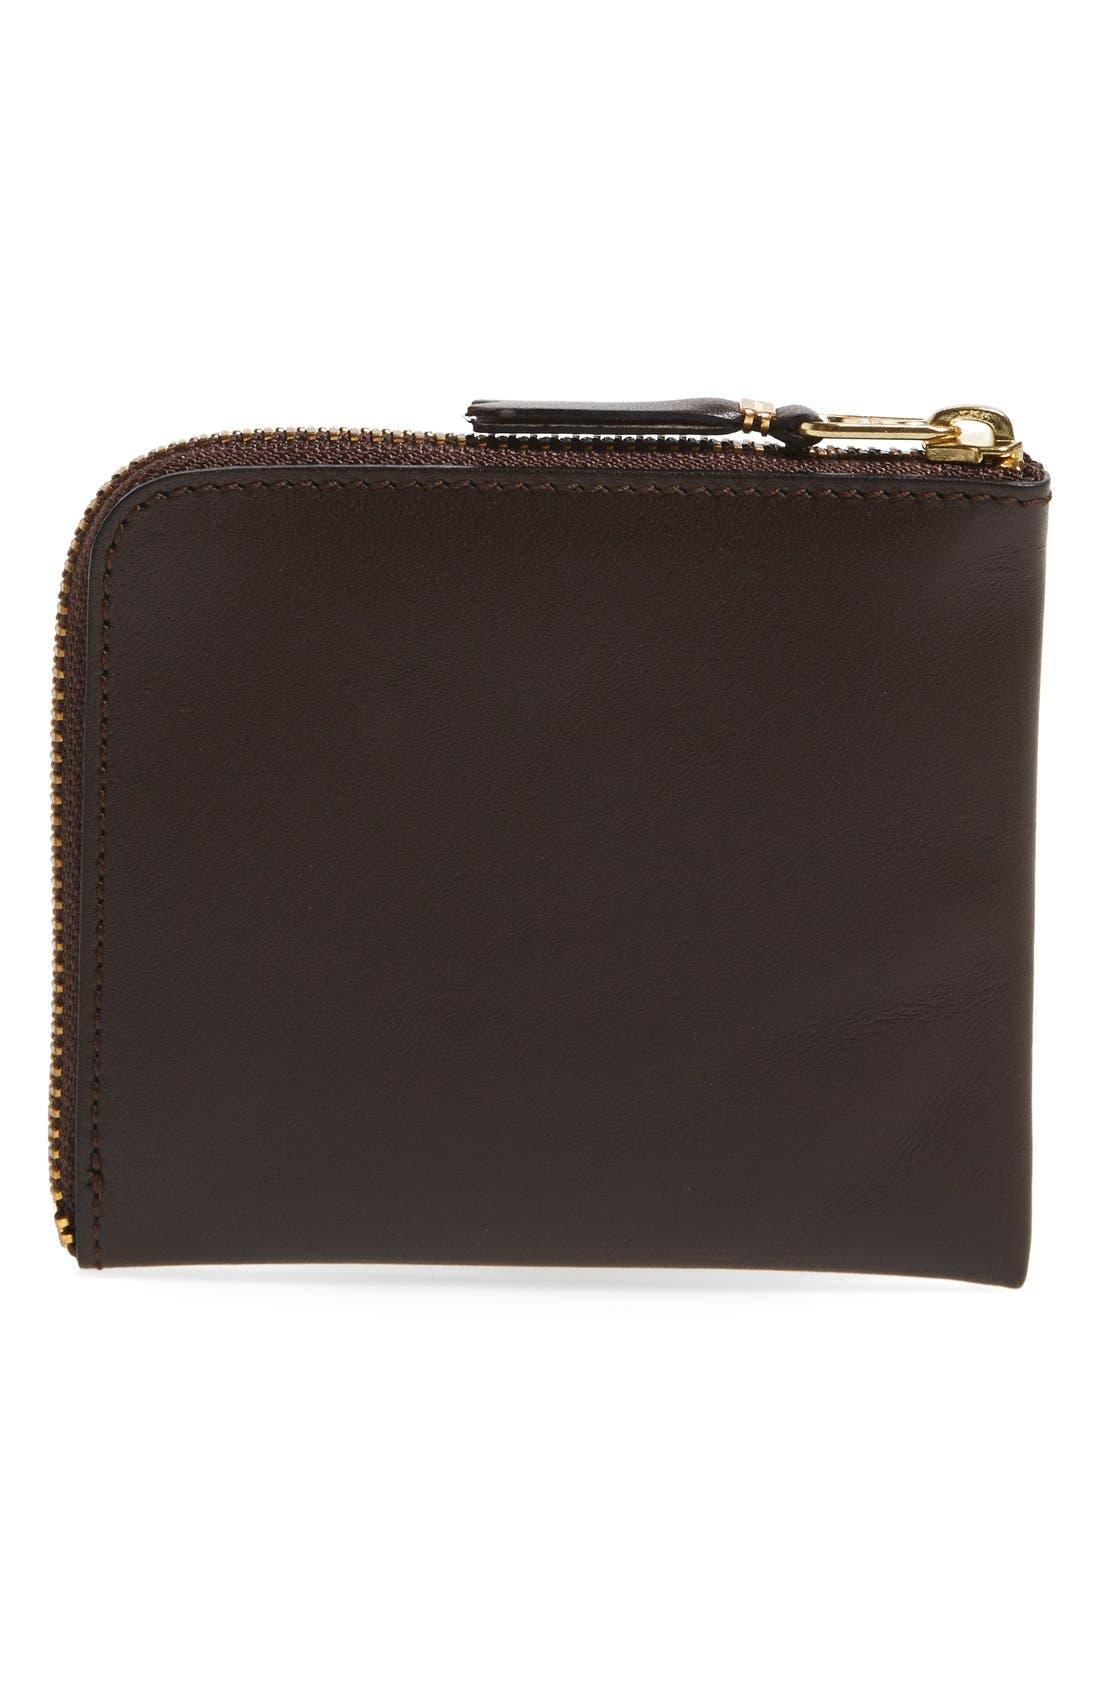 ,                             Half-Zip Leather Wallet,                             Alternate thumbnail 9, color,                             200